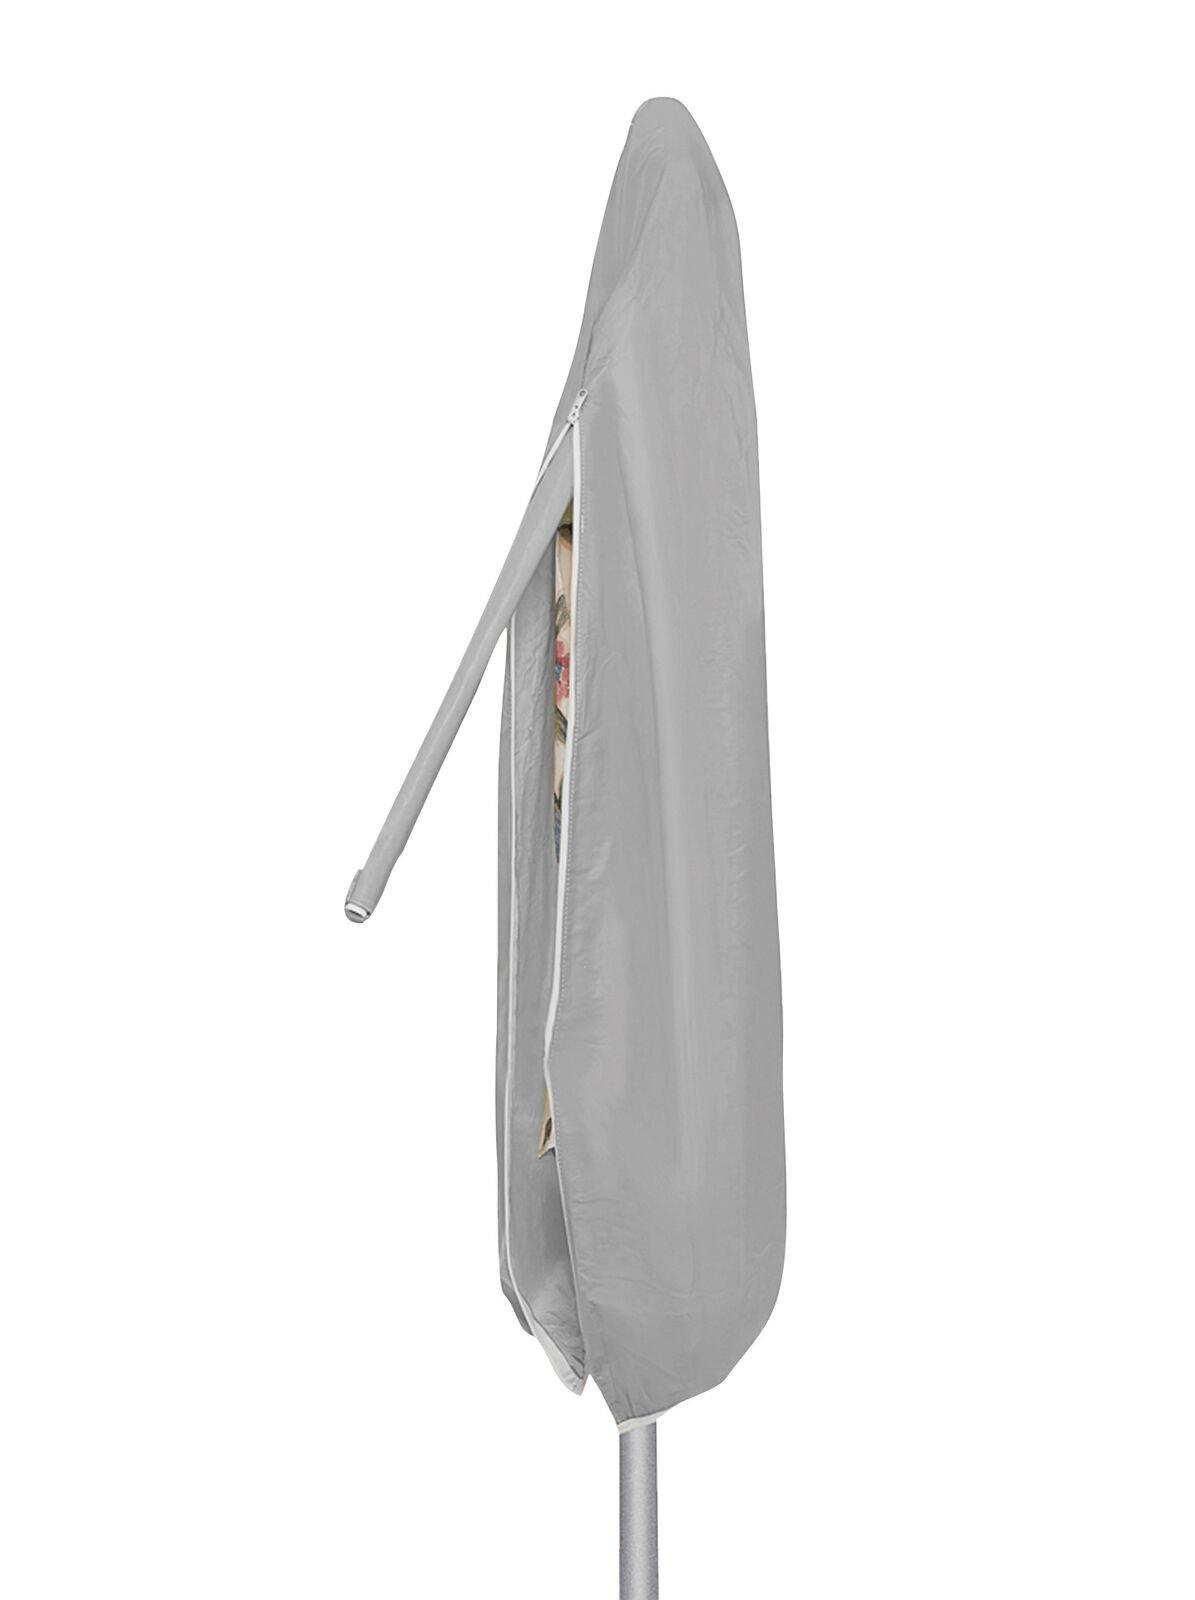 Protective Covers Weatherproof Umbrella Cover, 8.5 x 11 Feet, Gray